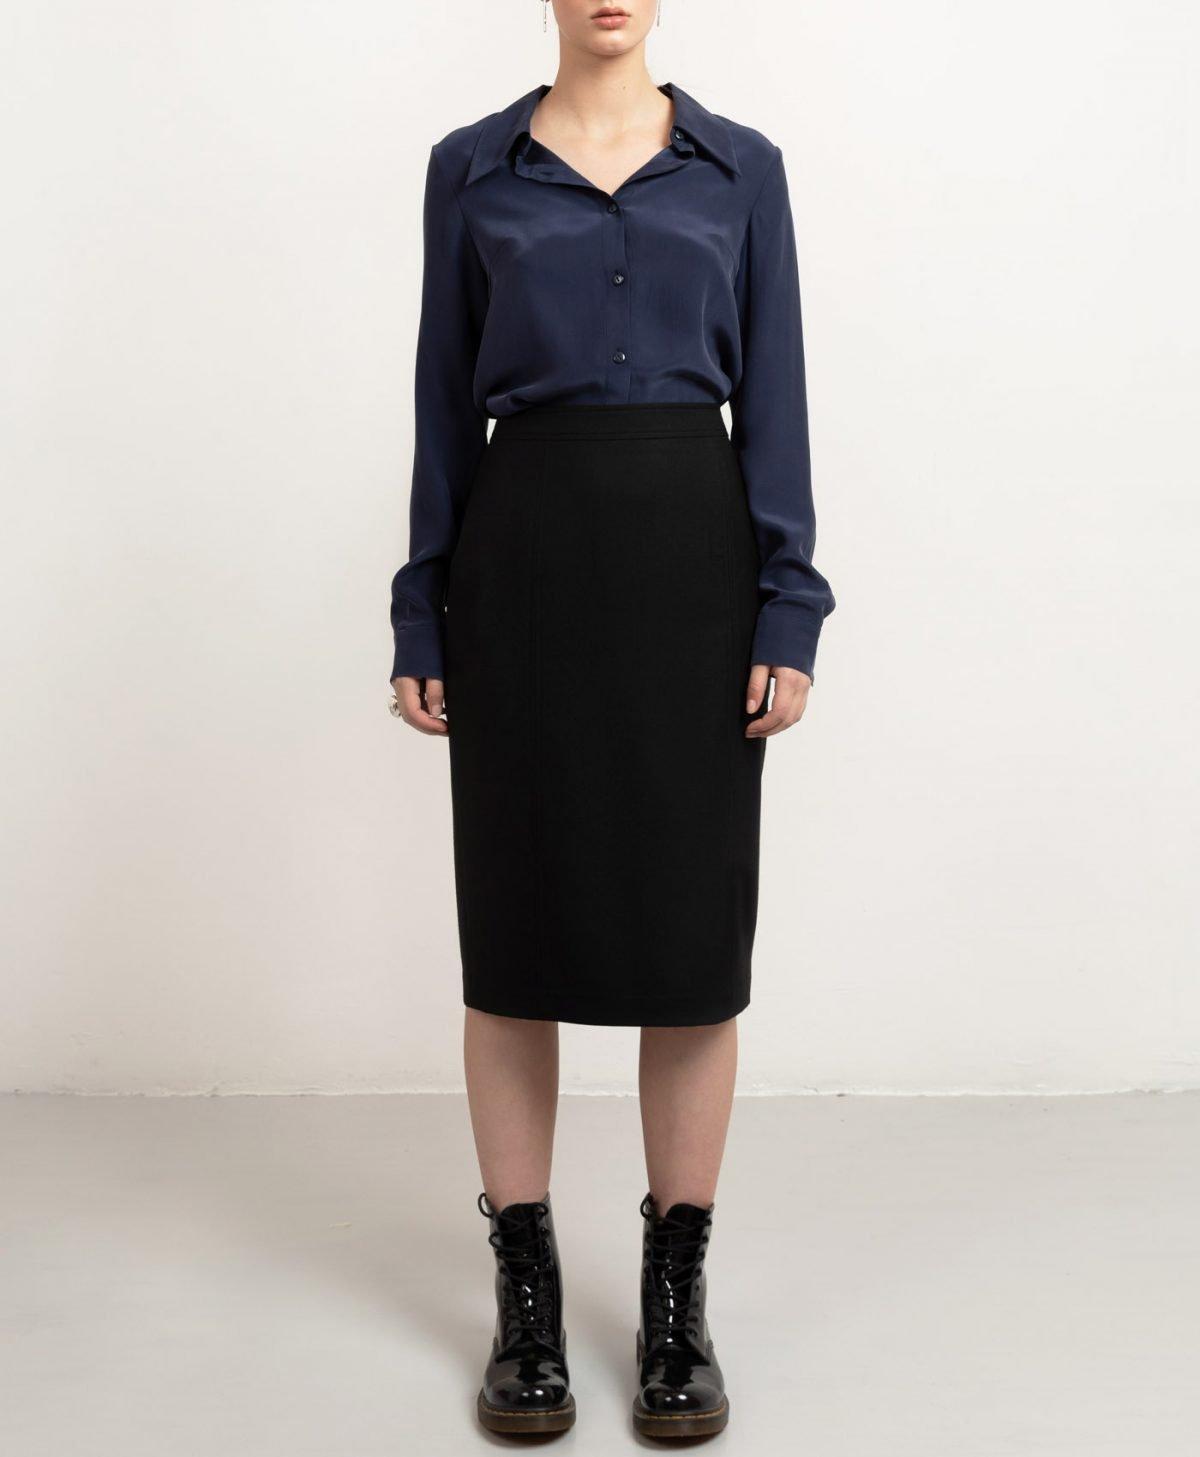 The pencil skirt